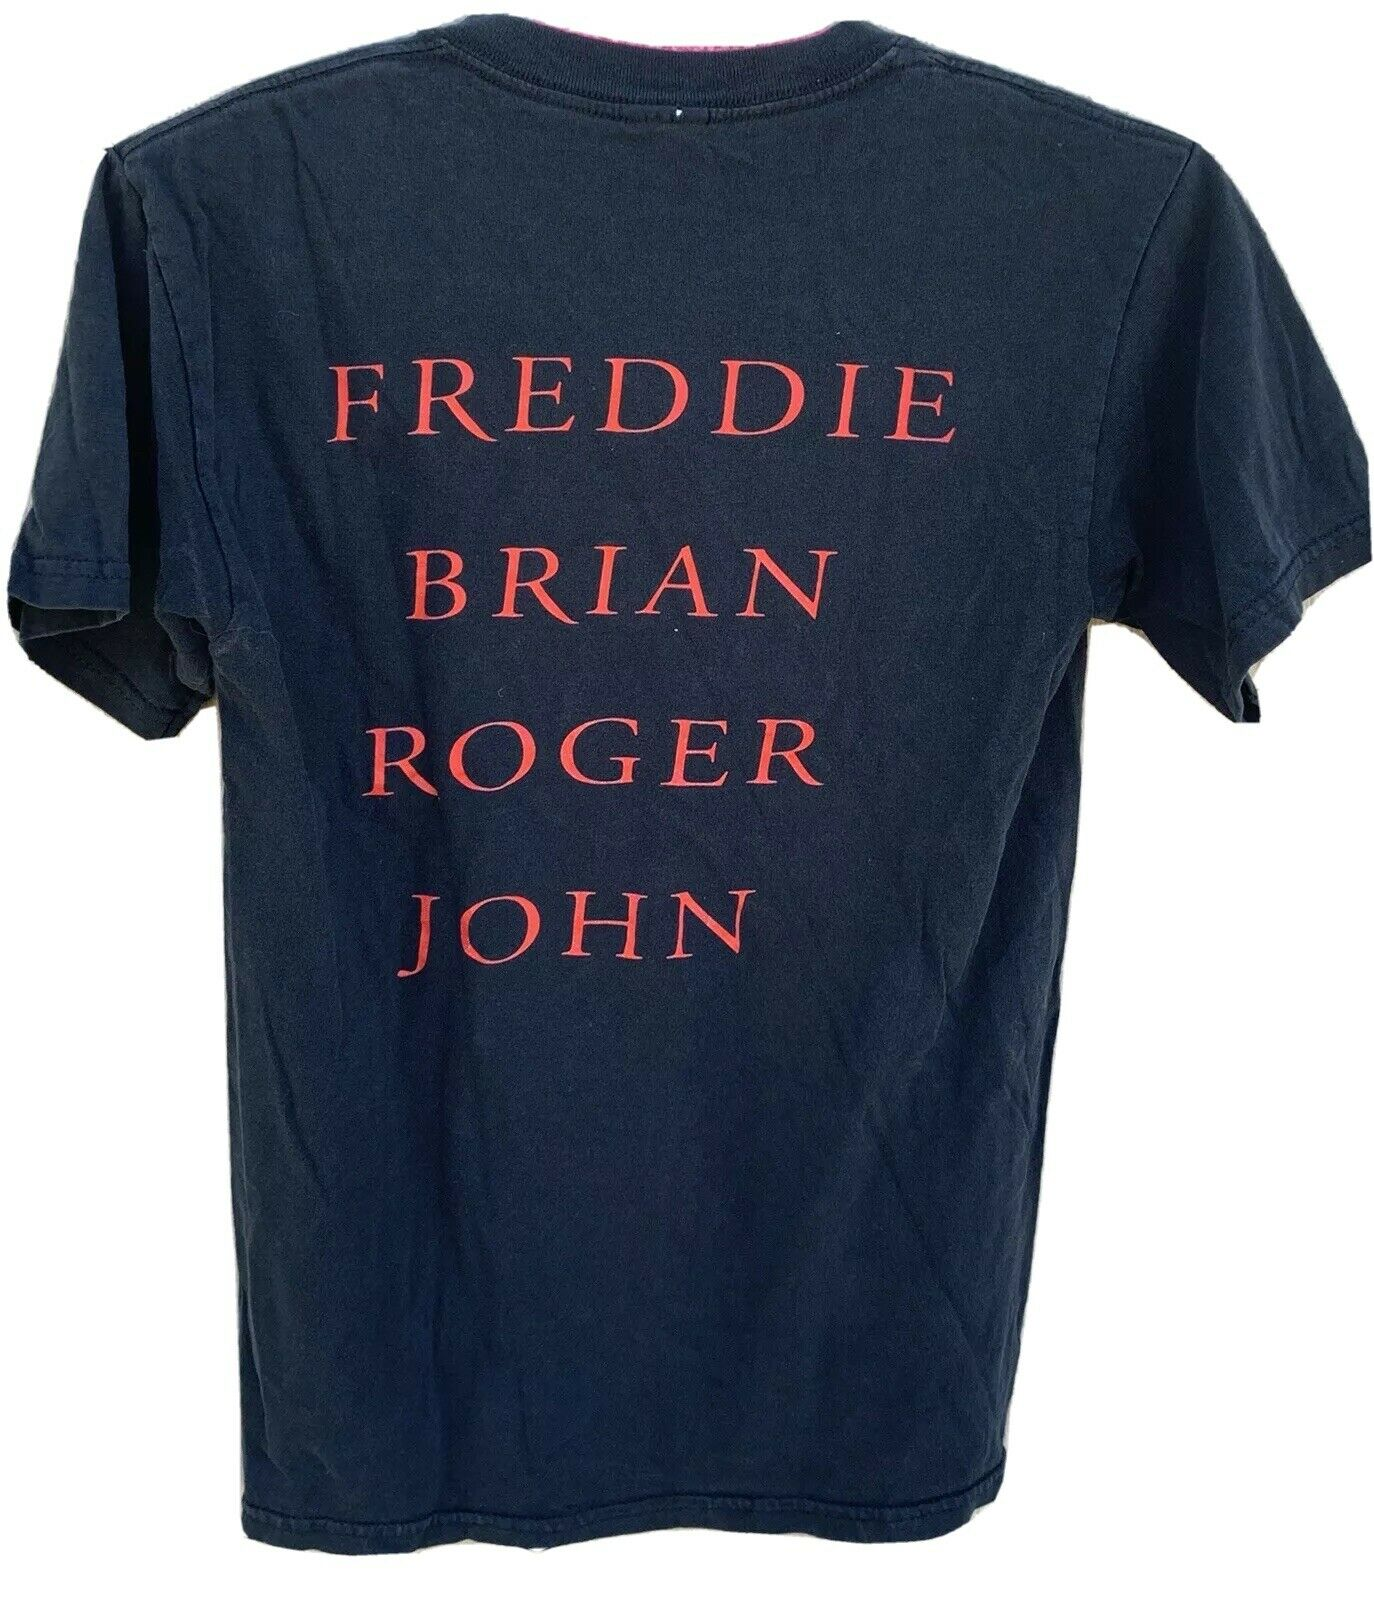 Queen Freddie Brian Roger John T-Shirt Graphics O… - image 2